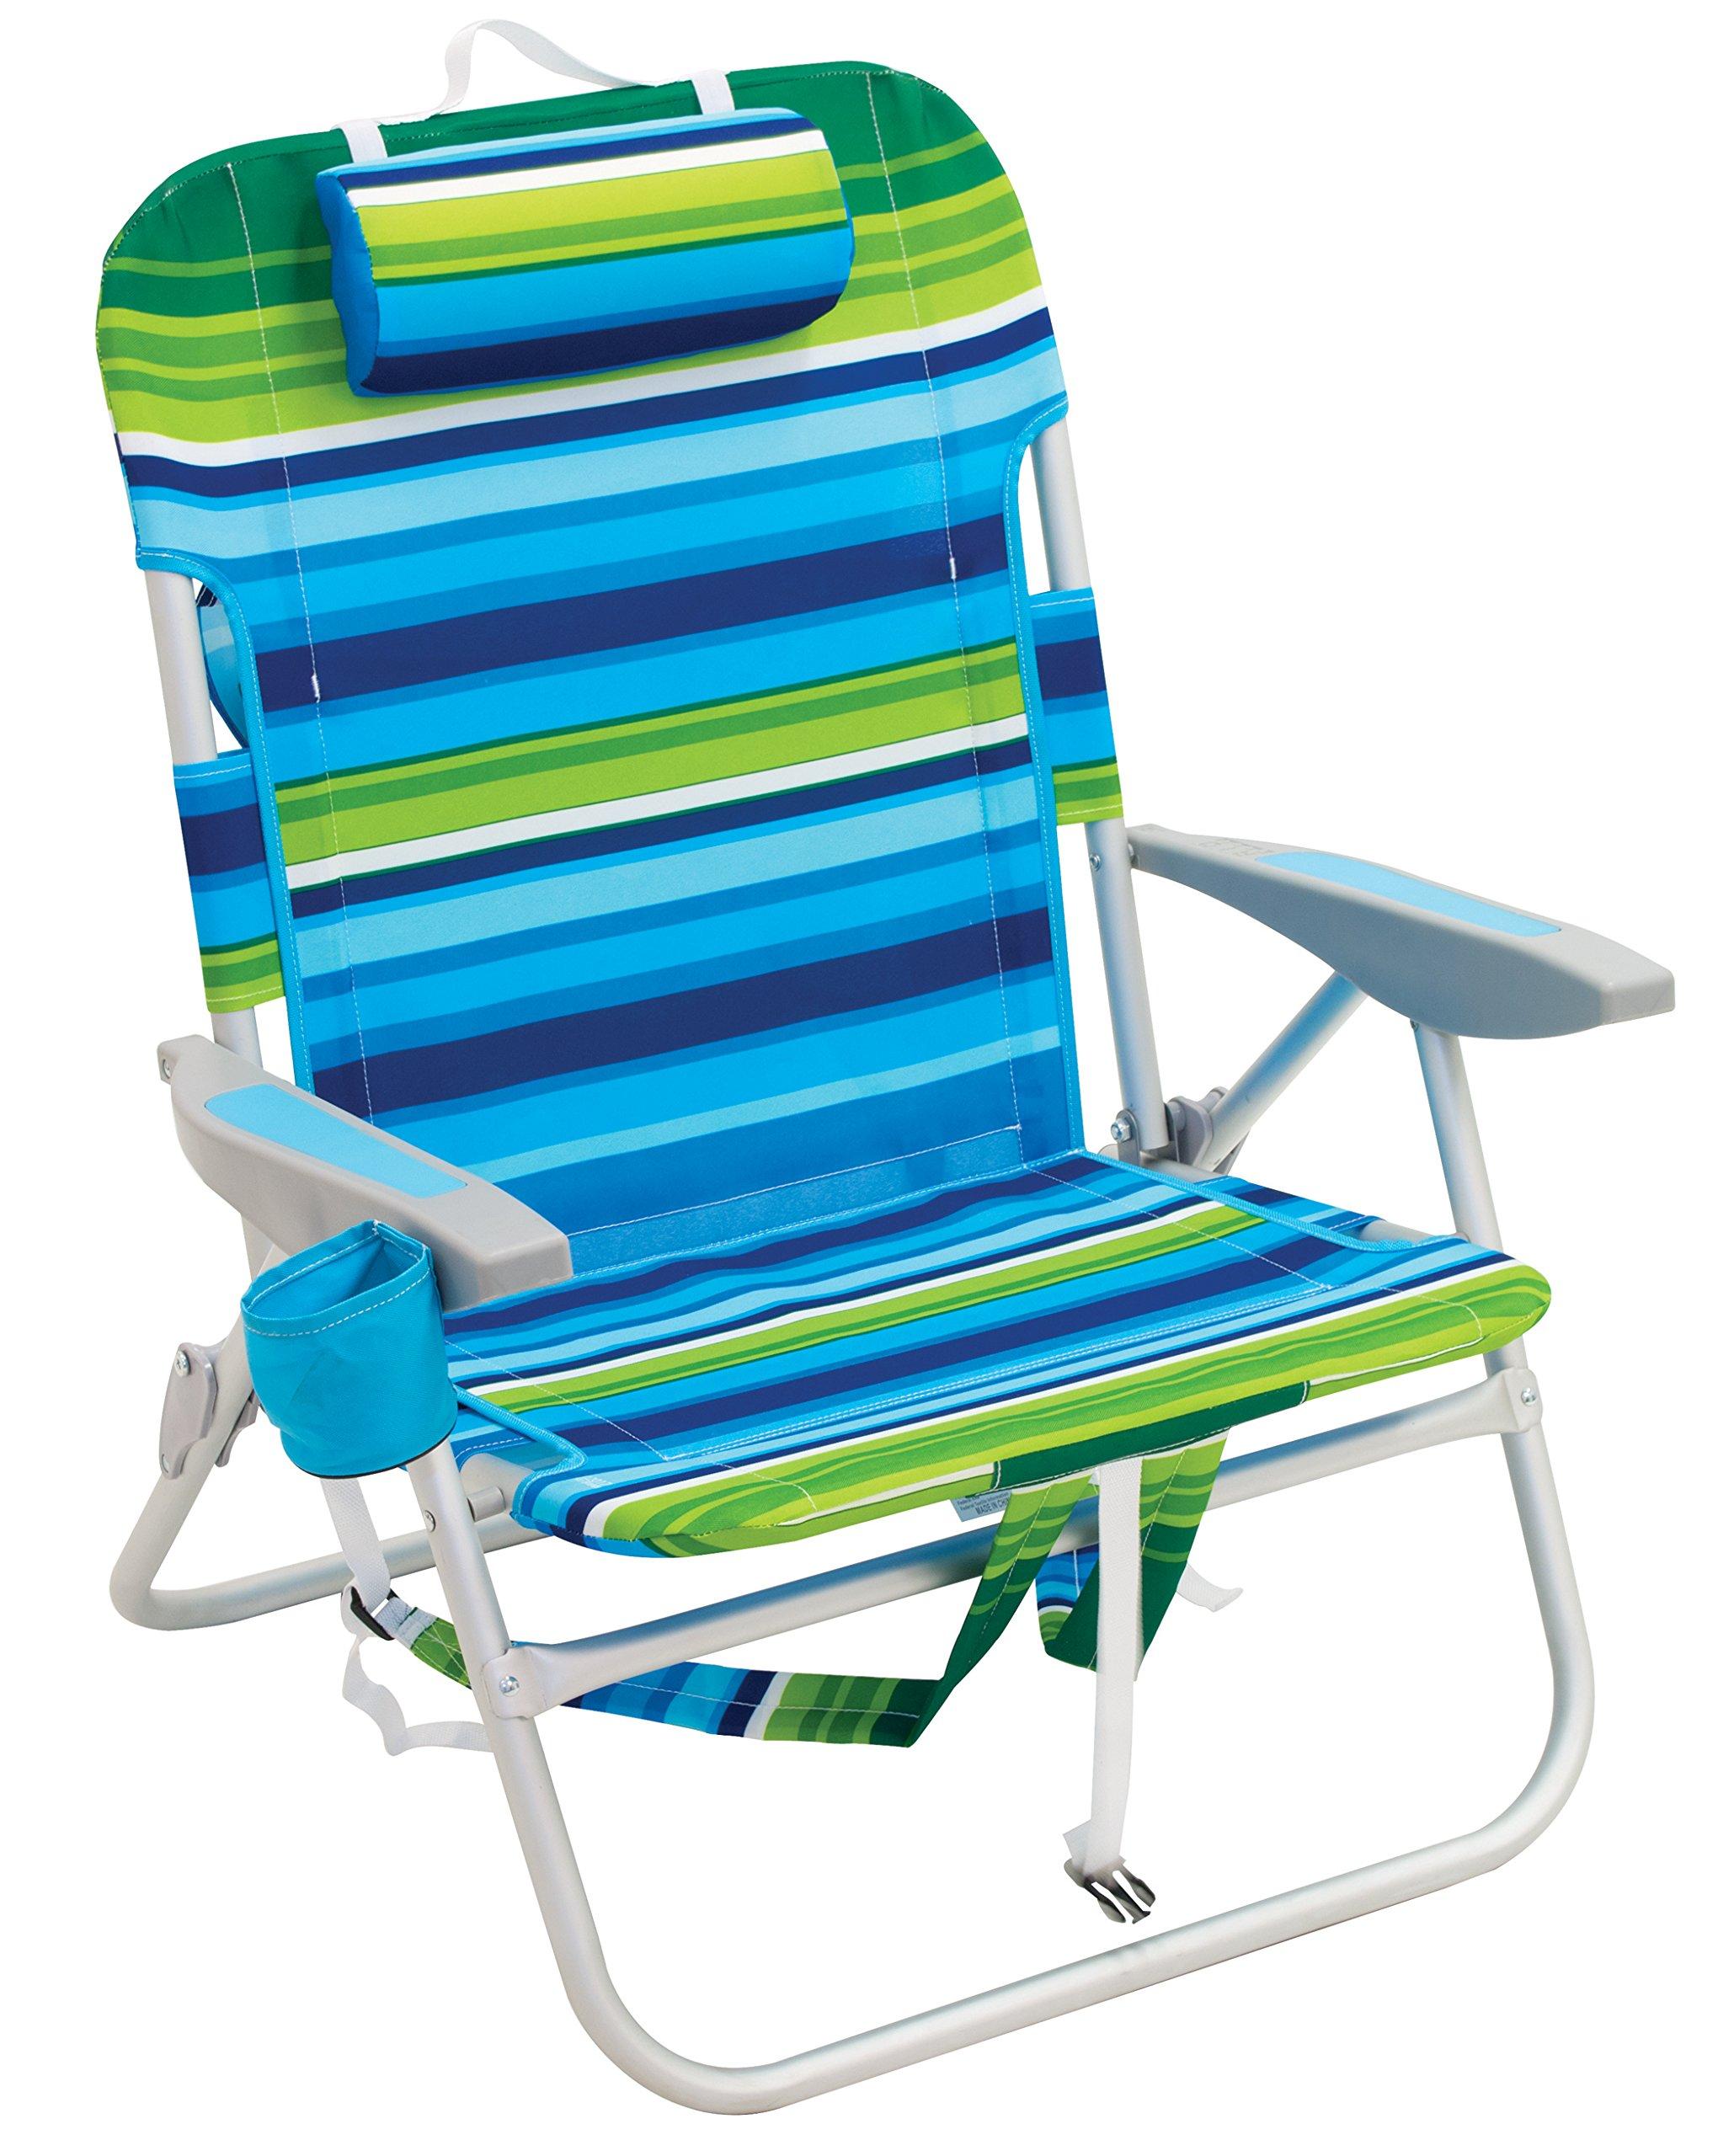 Rio Beach Big Boy Folding 13 Inch High Seat Backpack Beach or Camping Chair by RIO Gear